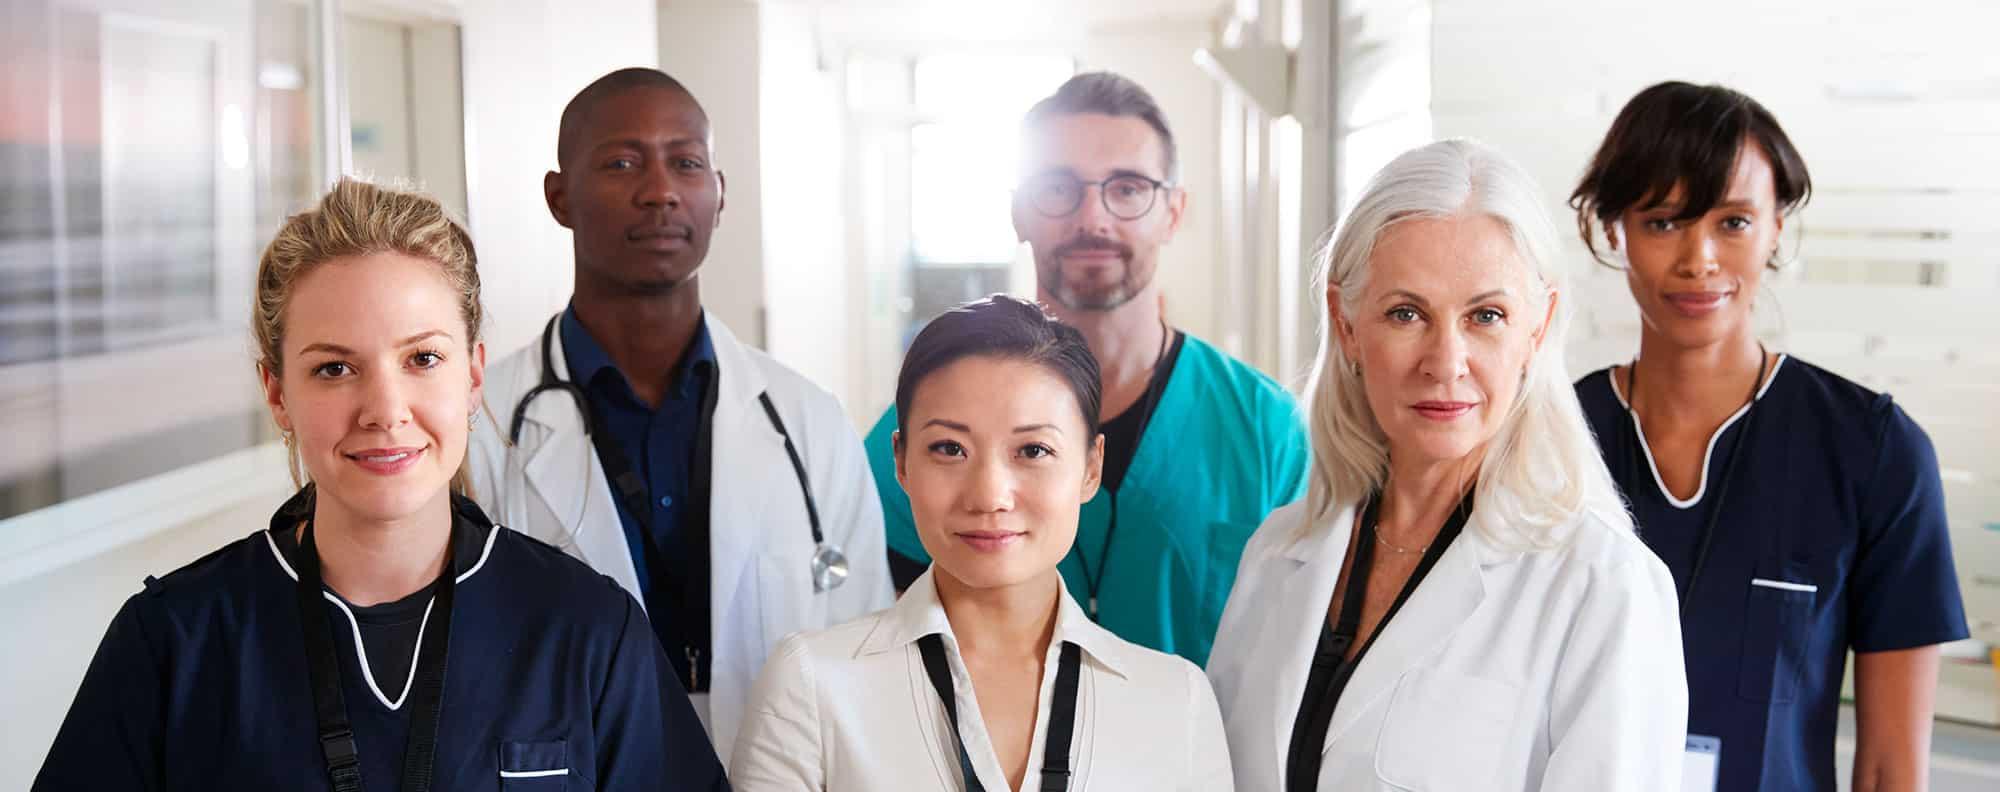 Nurse-Group